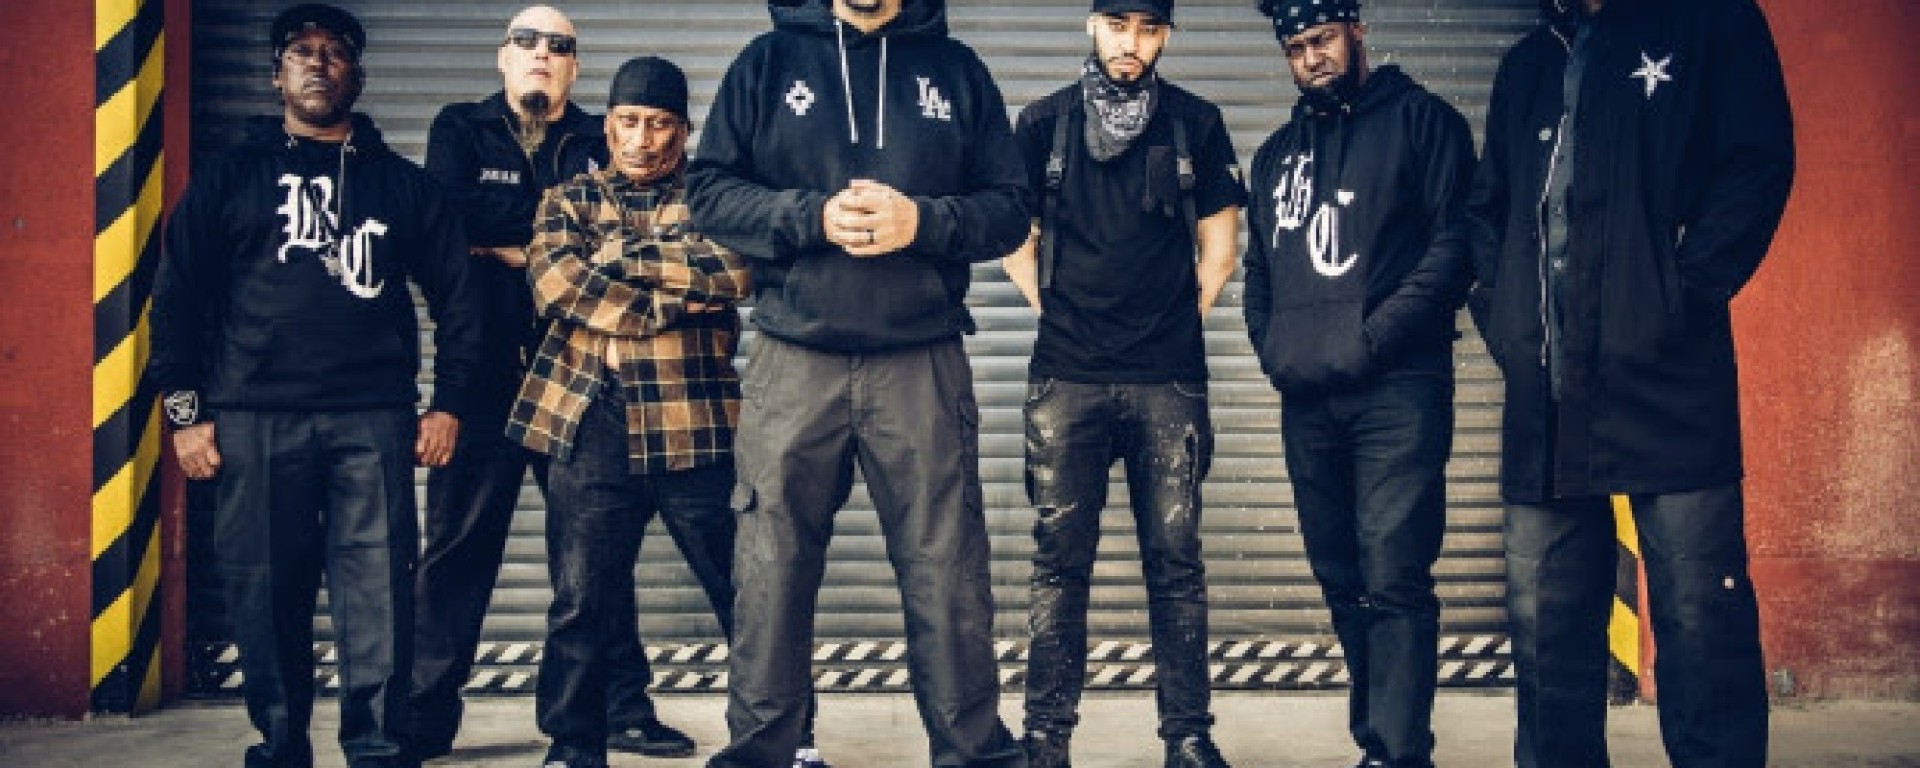 Body Count a câștigat premiul Best Metal Performance la premiile Grammy 2021